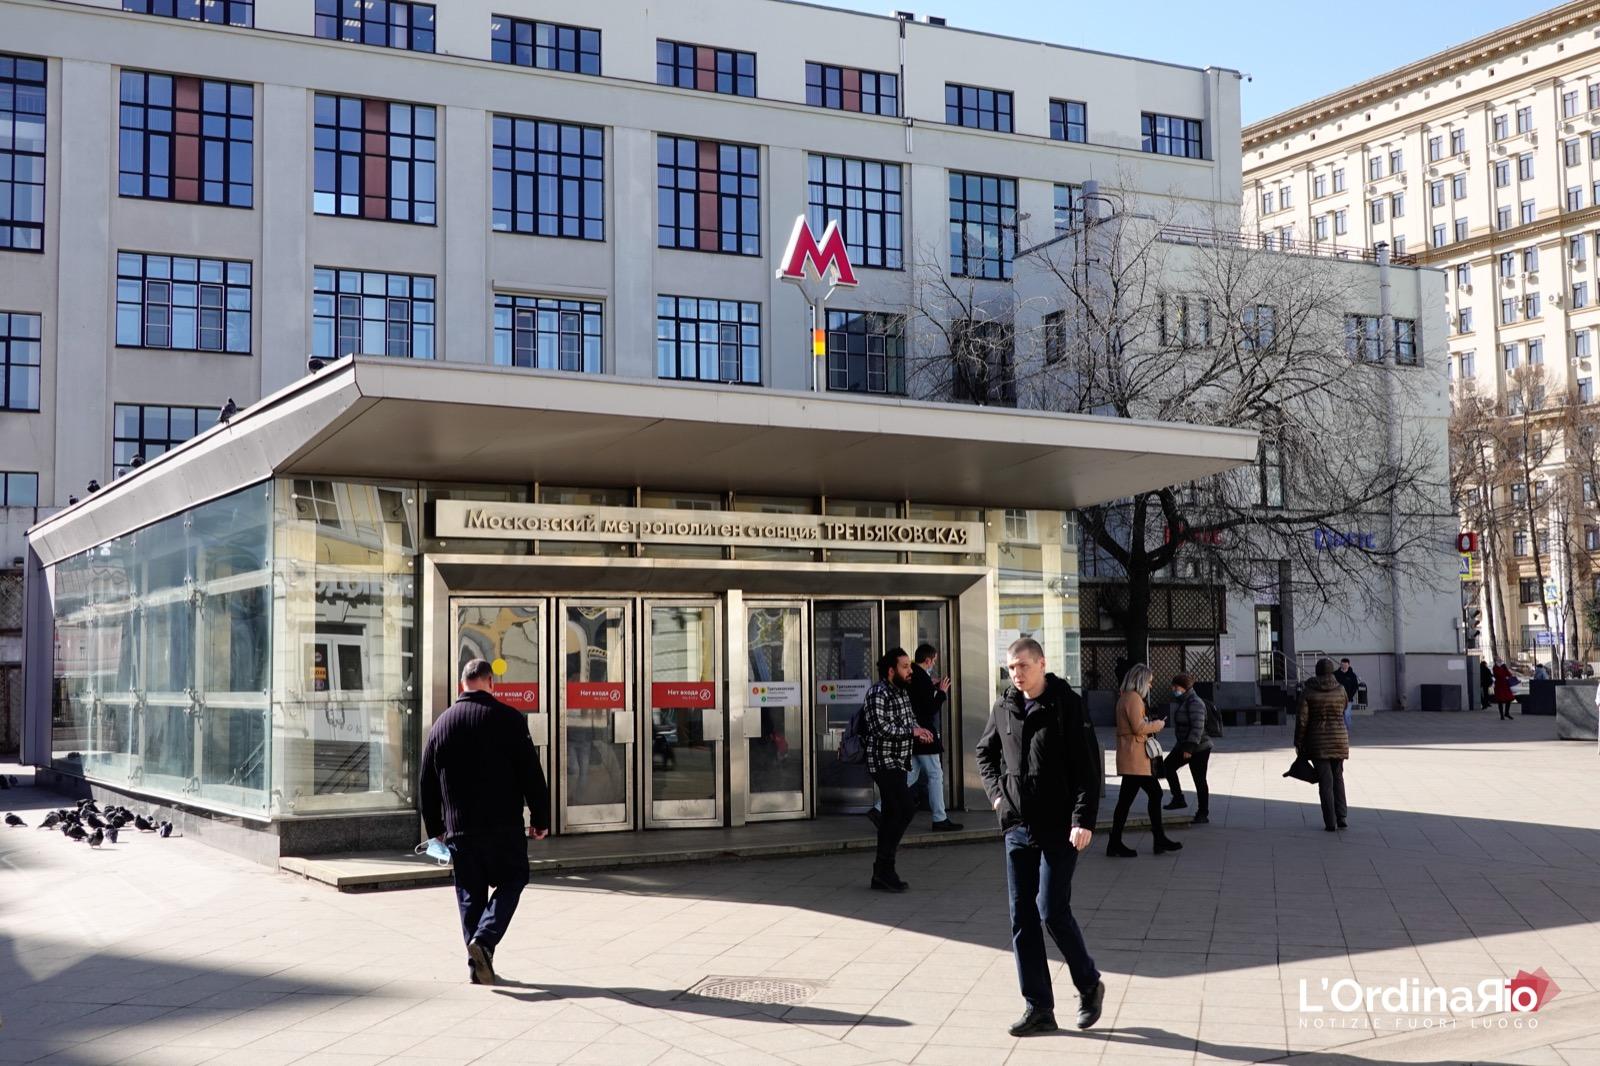 La stazione della metropolitana Tretyakovskaya